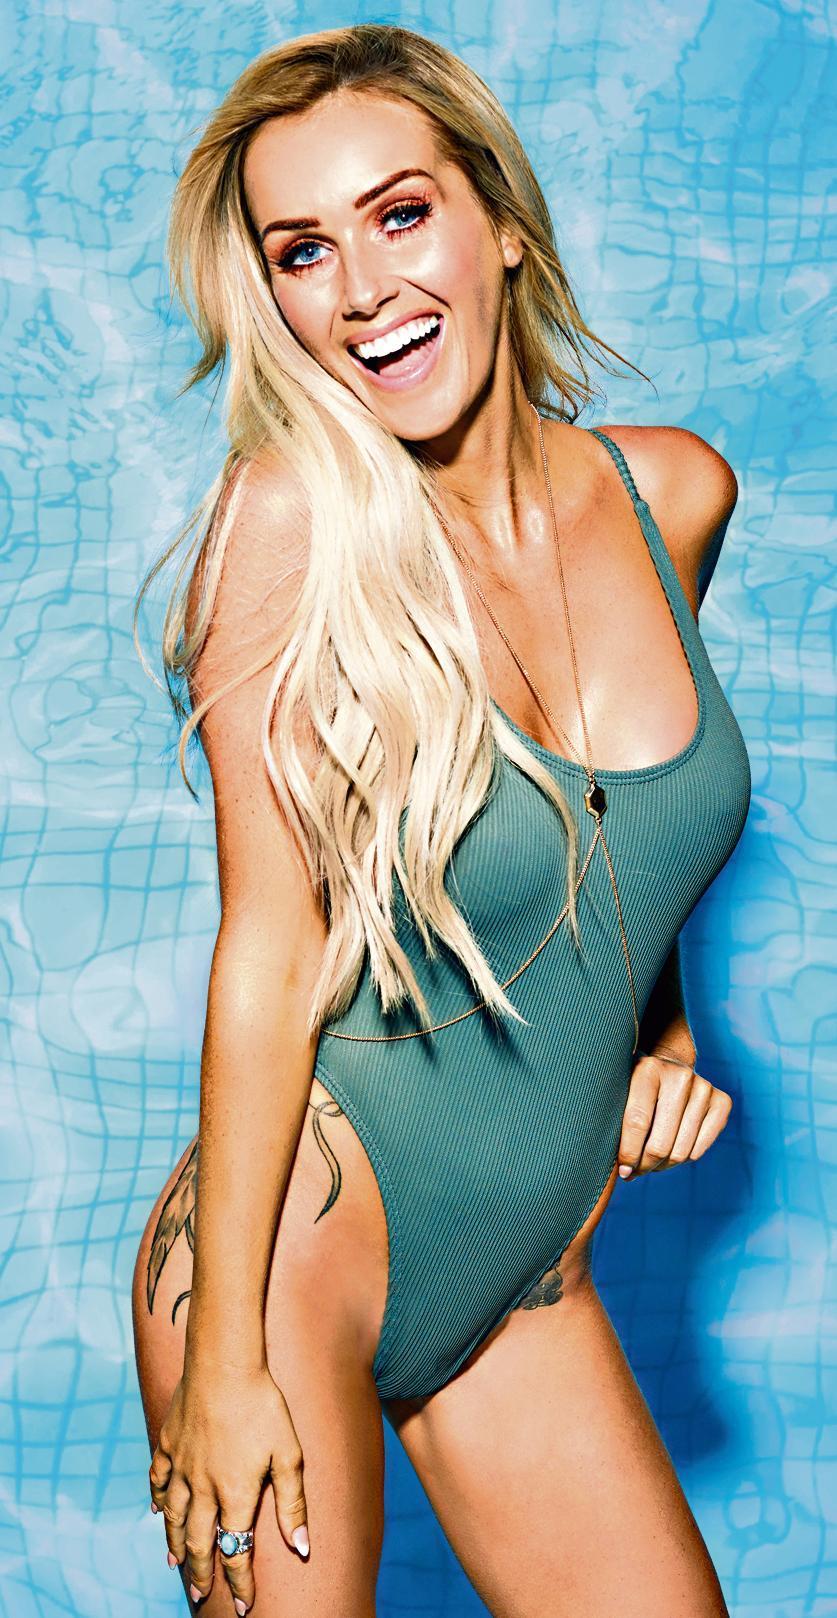 Instagram Laura Anderson nude (19 photo), Topless, Bikini, Instagram, swimsuit 2020